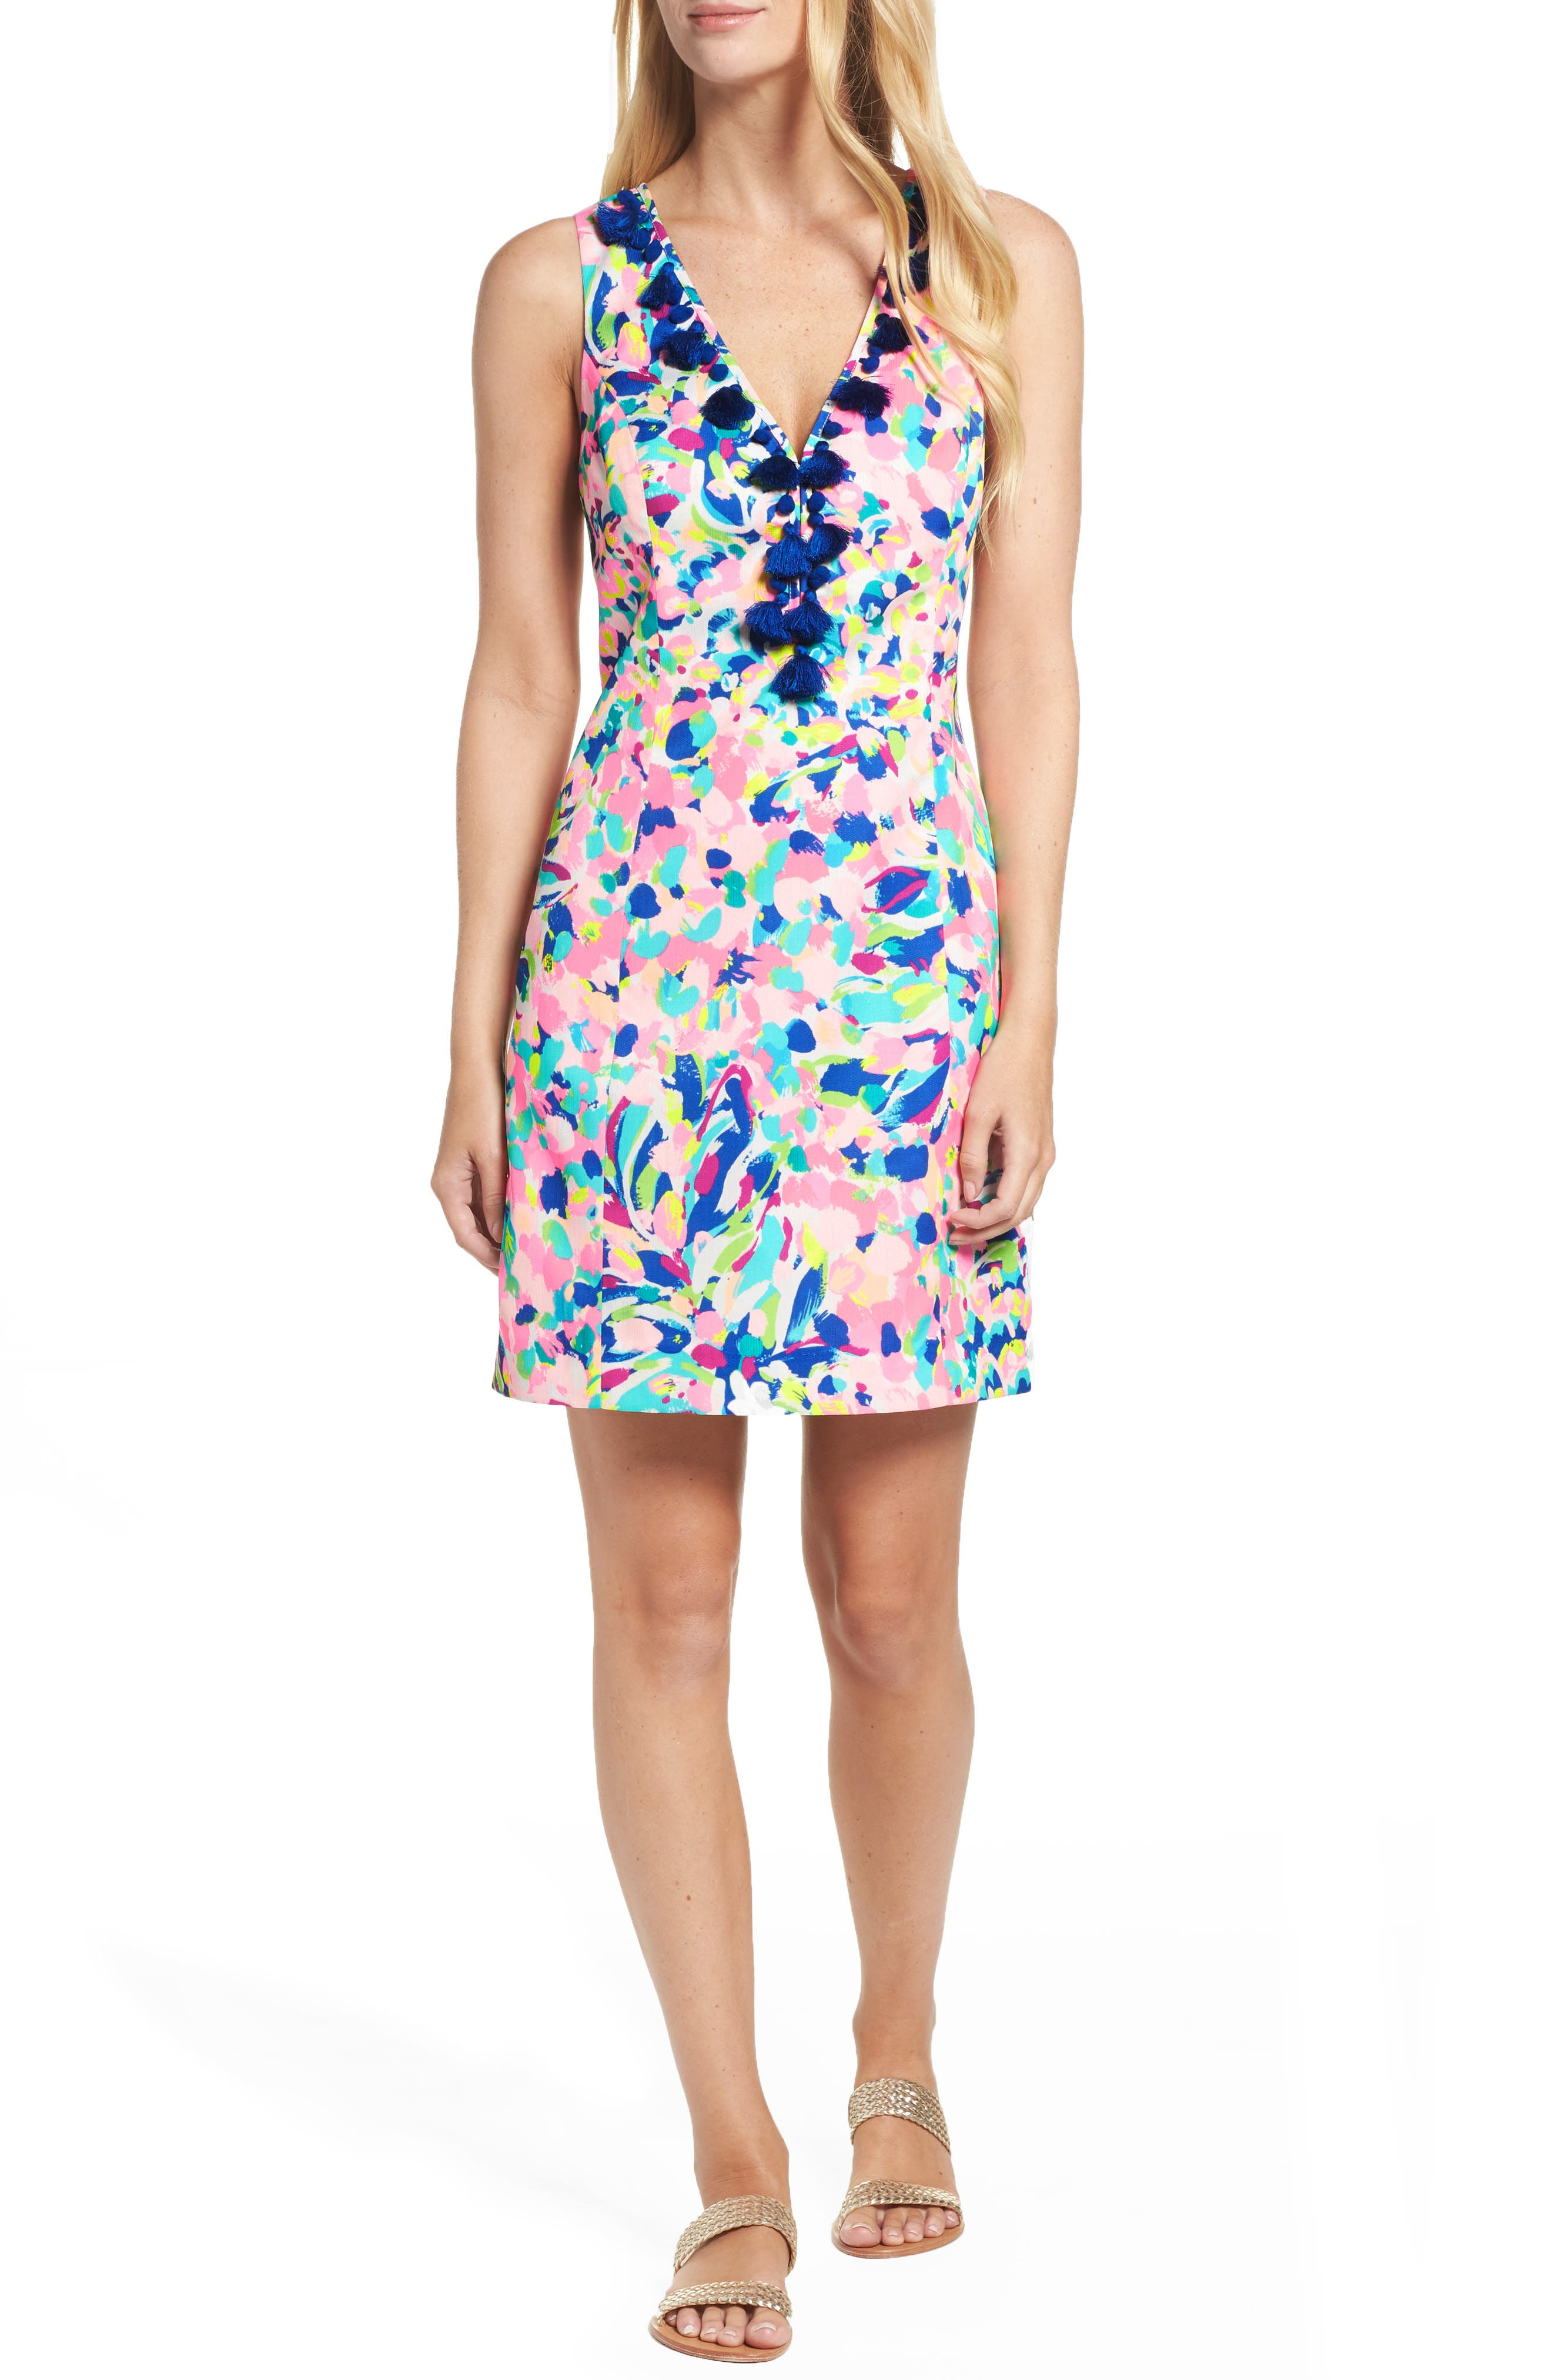 Cabrey Sheath Dress,                         Main,                         color, 698